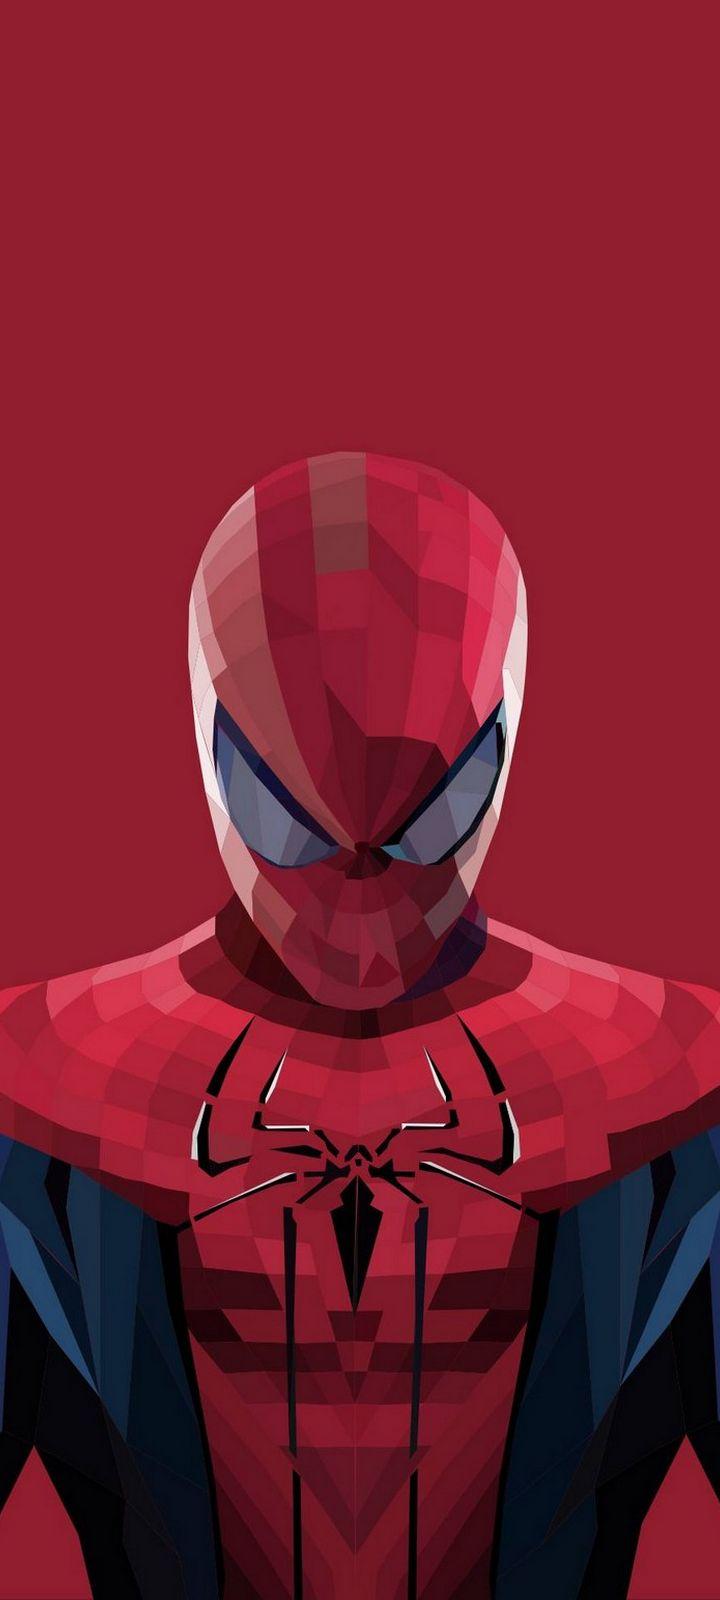 Superhero Spiderman Cartoon Wallpaper Iphone Spiderman Wallpaper 4k 720x1600 Download Hd Wallpaper Wallpapertip